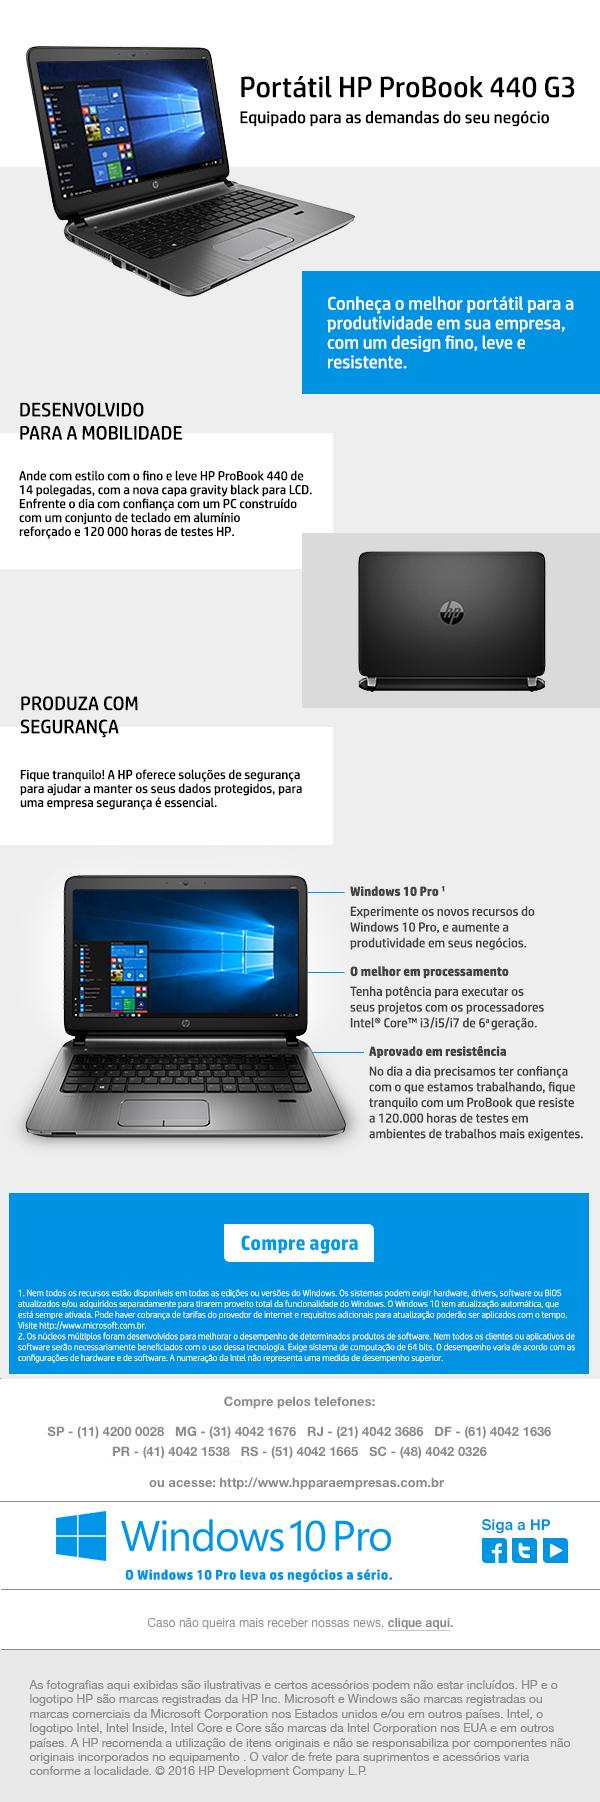 Portátil HP ProBook 440 G3